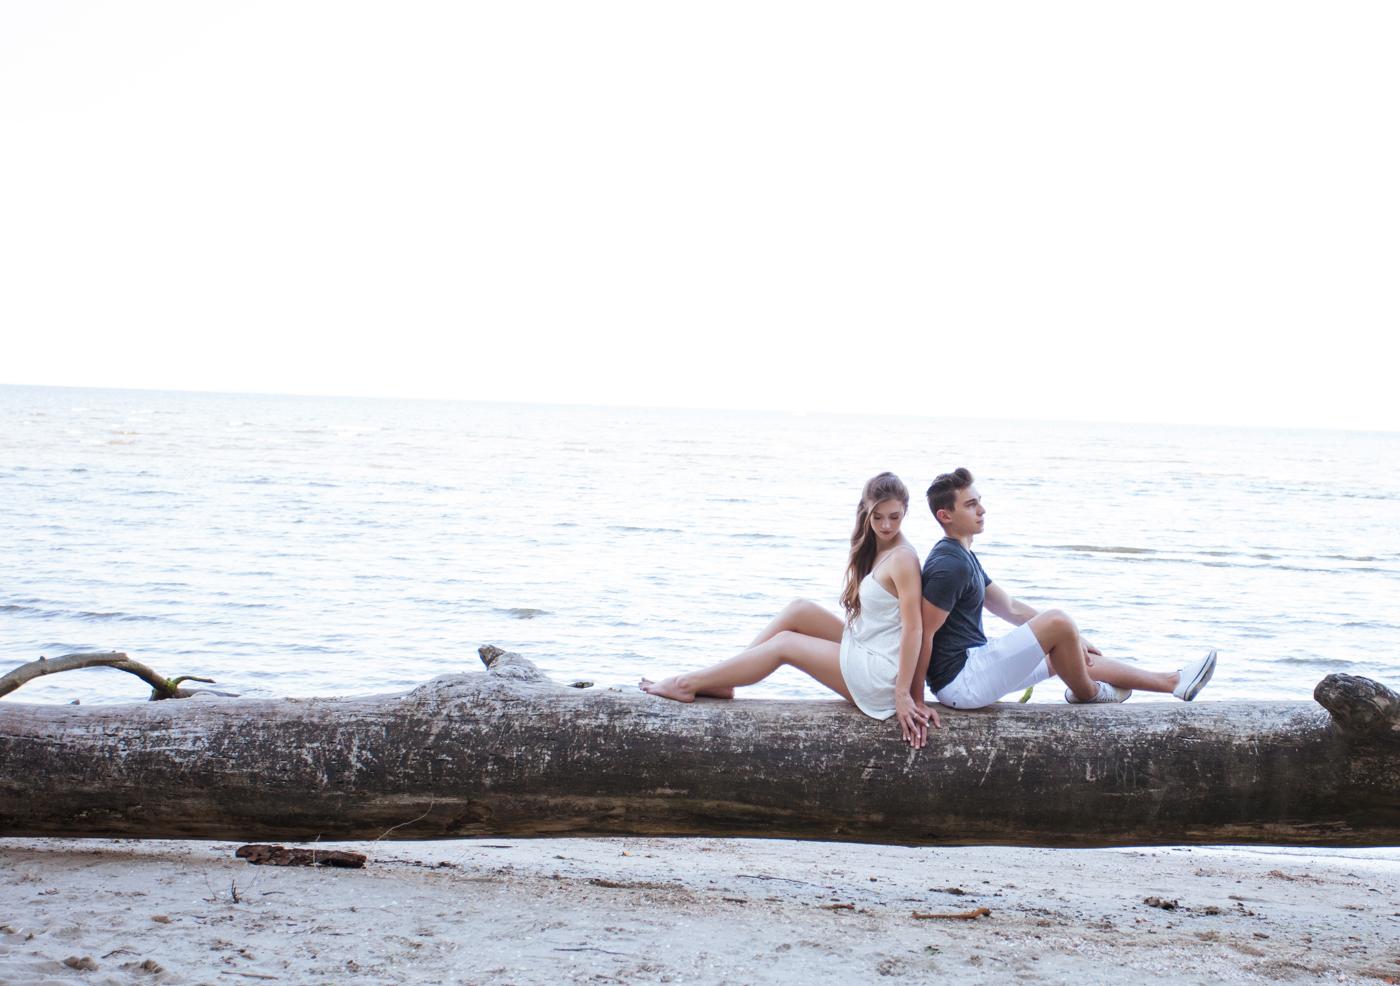 summer-beach-engagement-shoot-ksenia-pro-photography-38